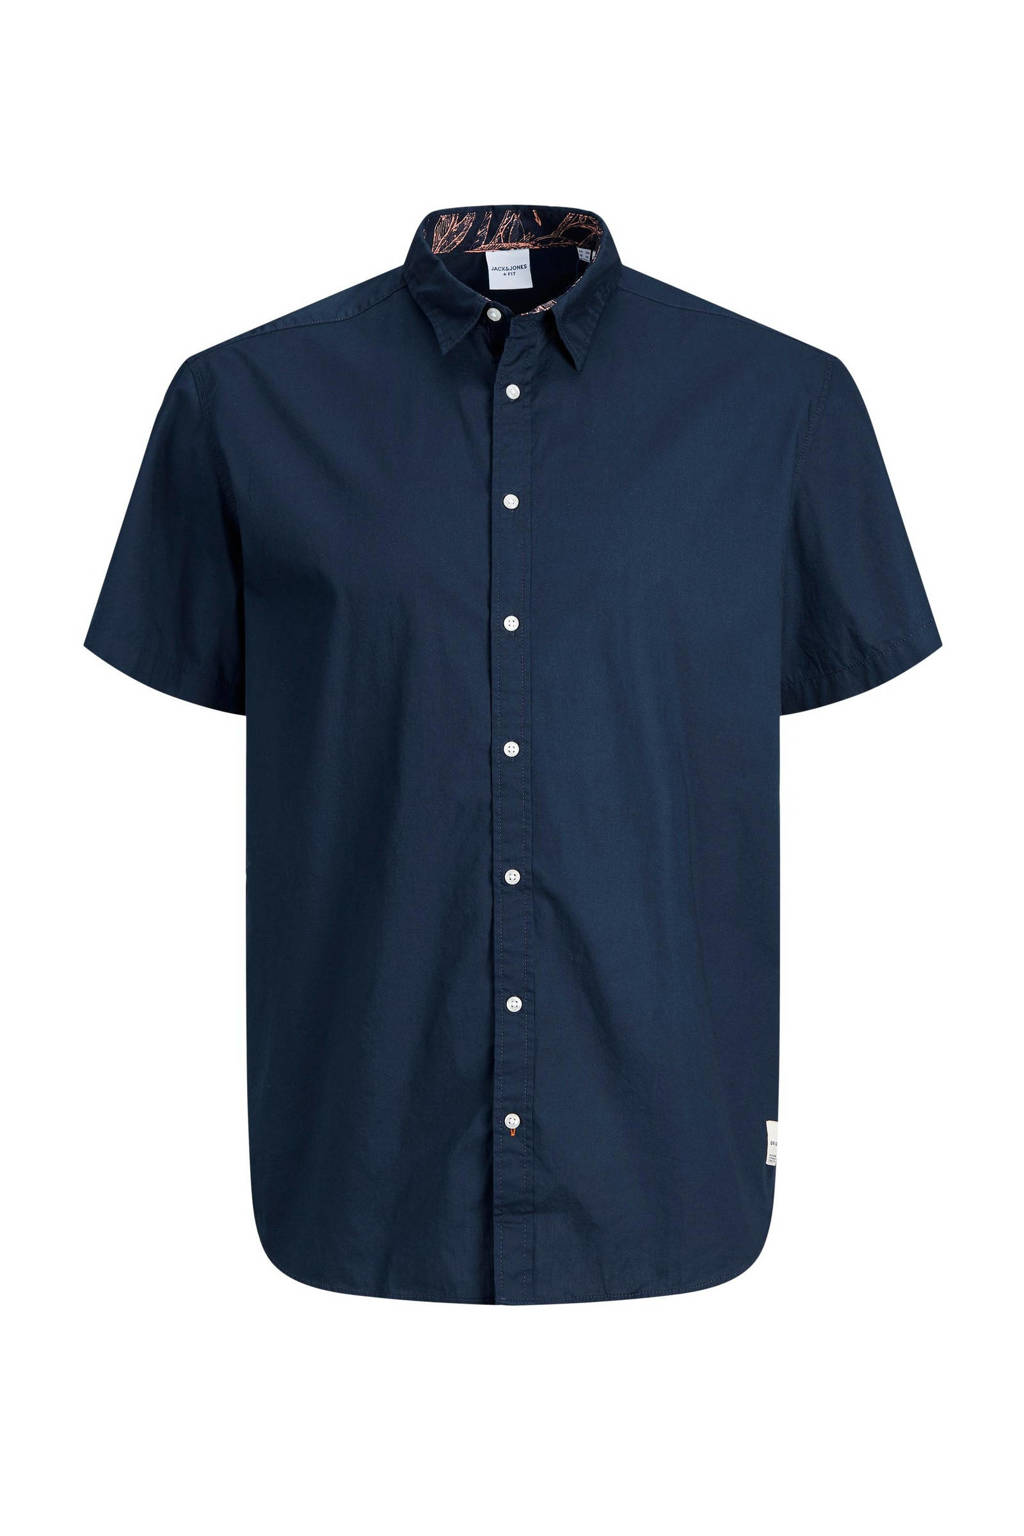 JACK & JONES PLUS SIZE regular fit overhemd Charlie Plus Size donkerblauw, Donkerblauw